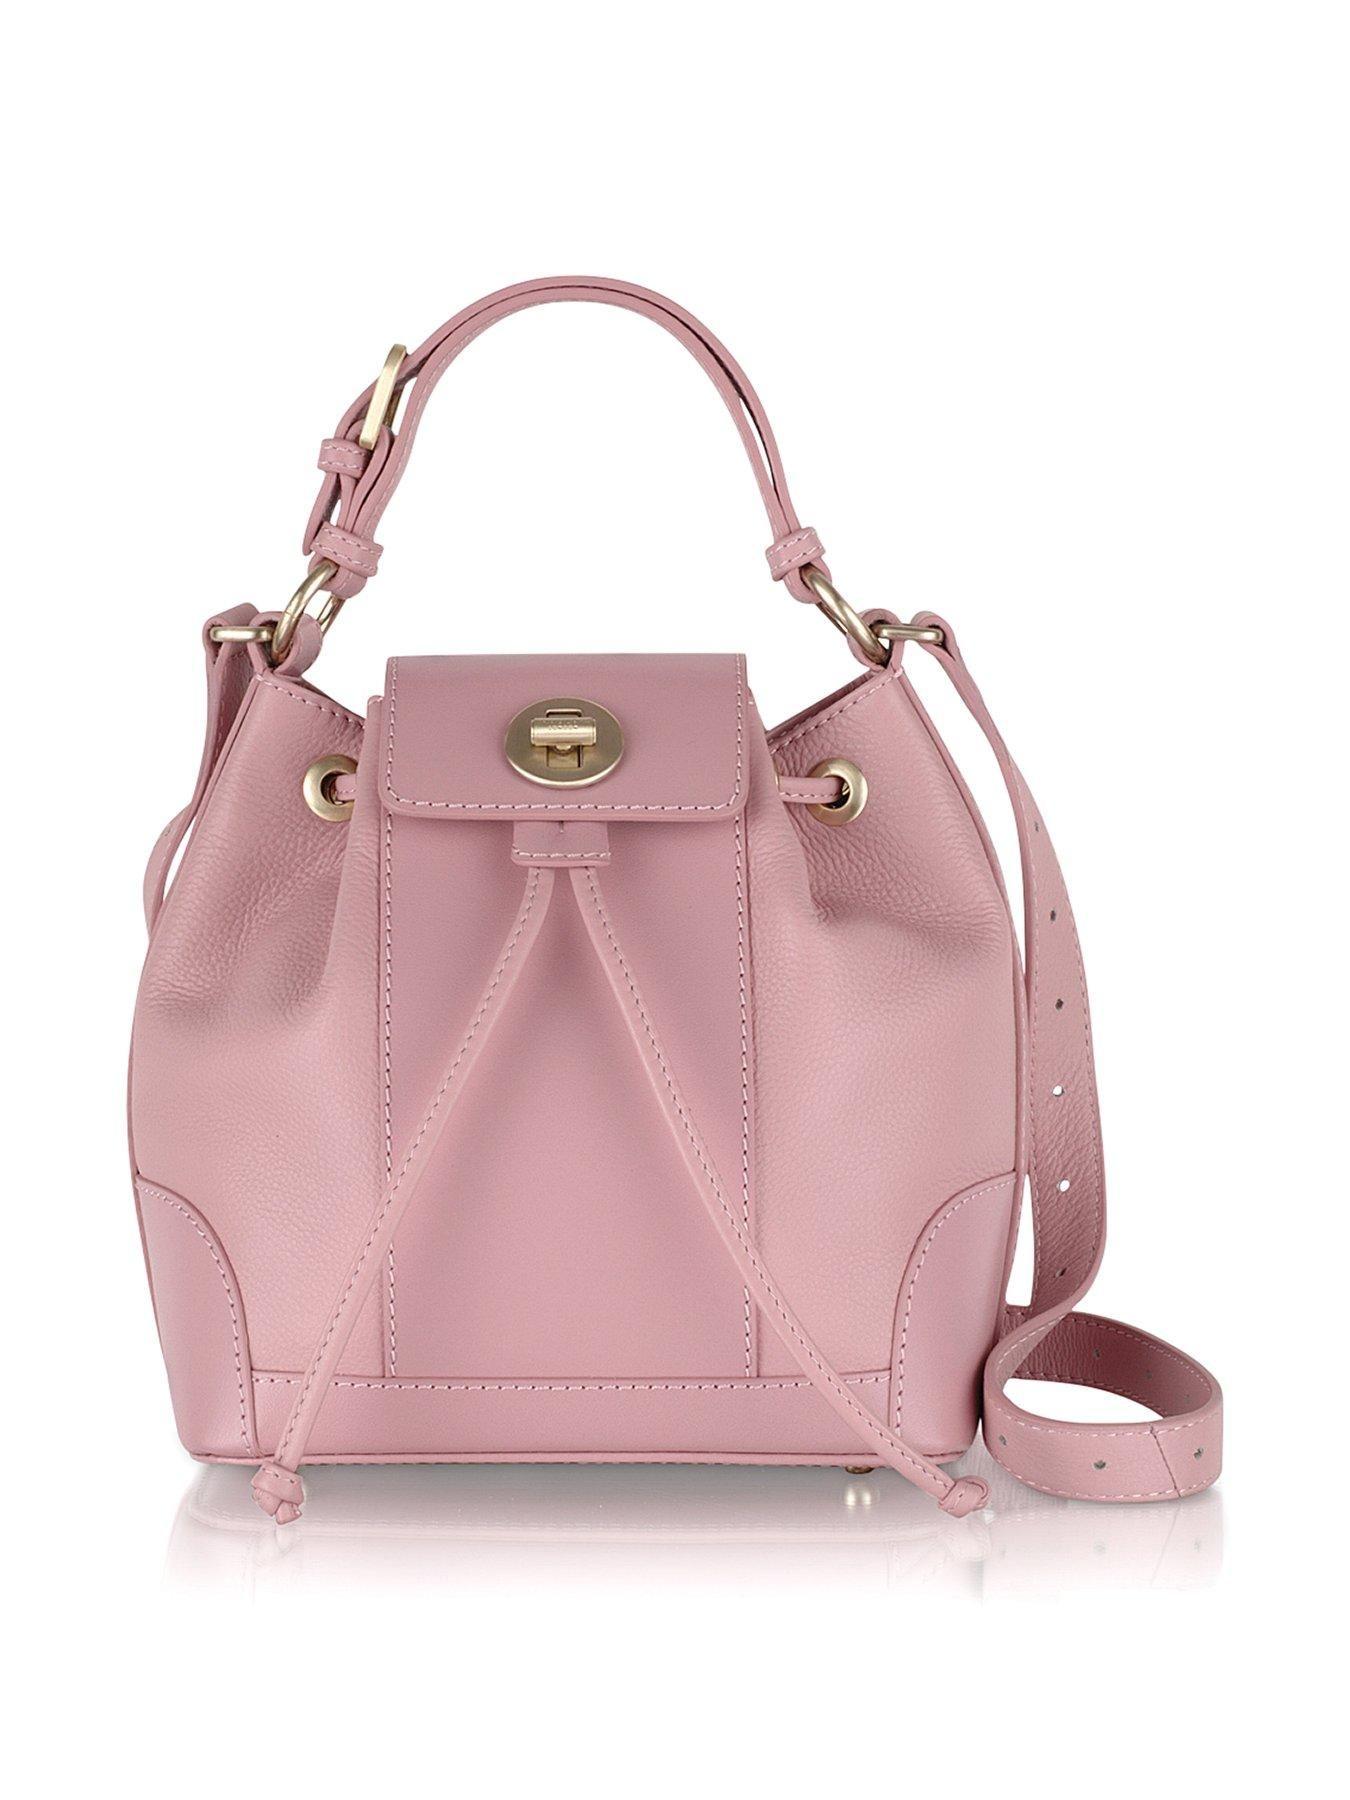 Leather Gifts, Leather Bags Handmade, Radley Bags, Grab Bags, Duffel Bag, c9352c0ac9